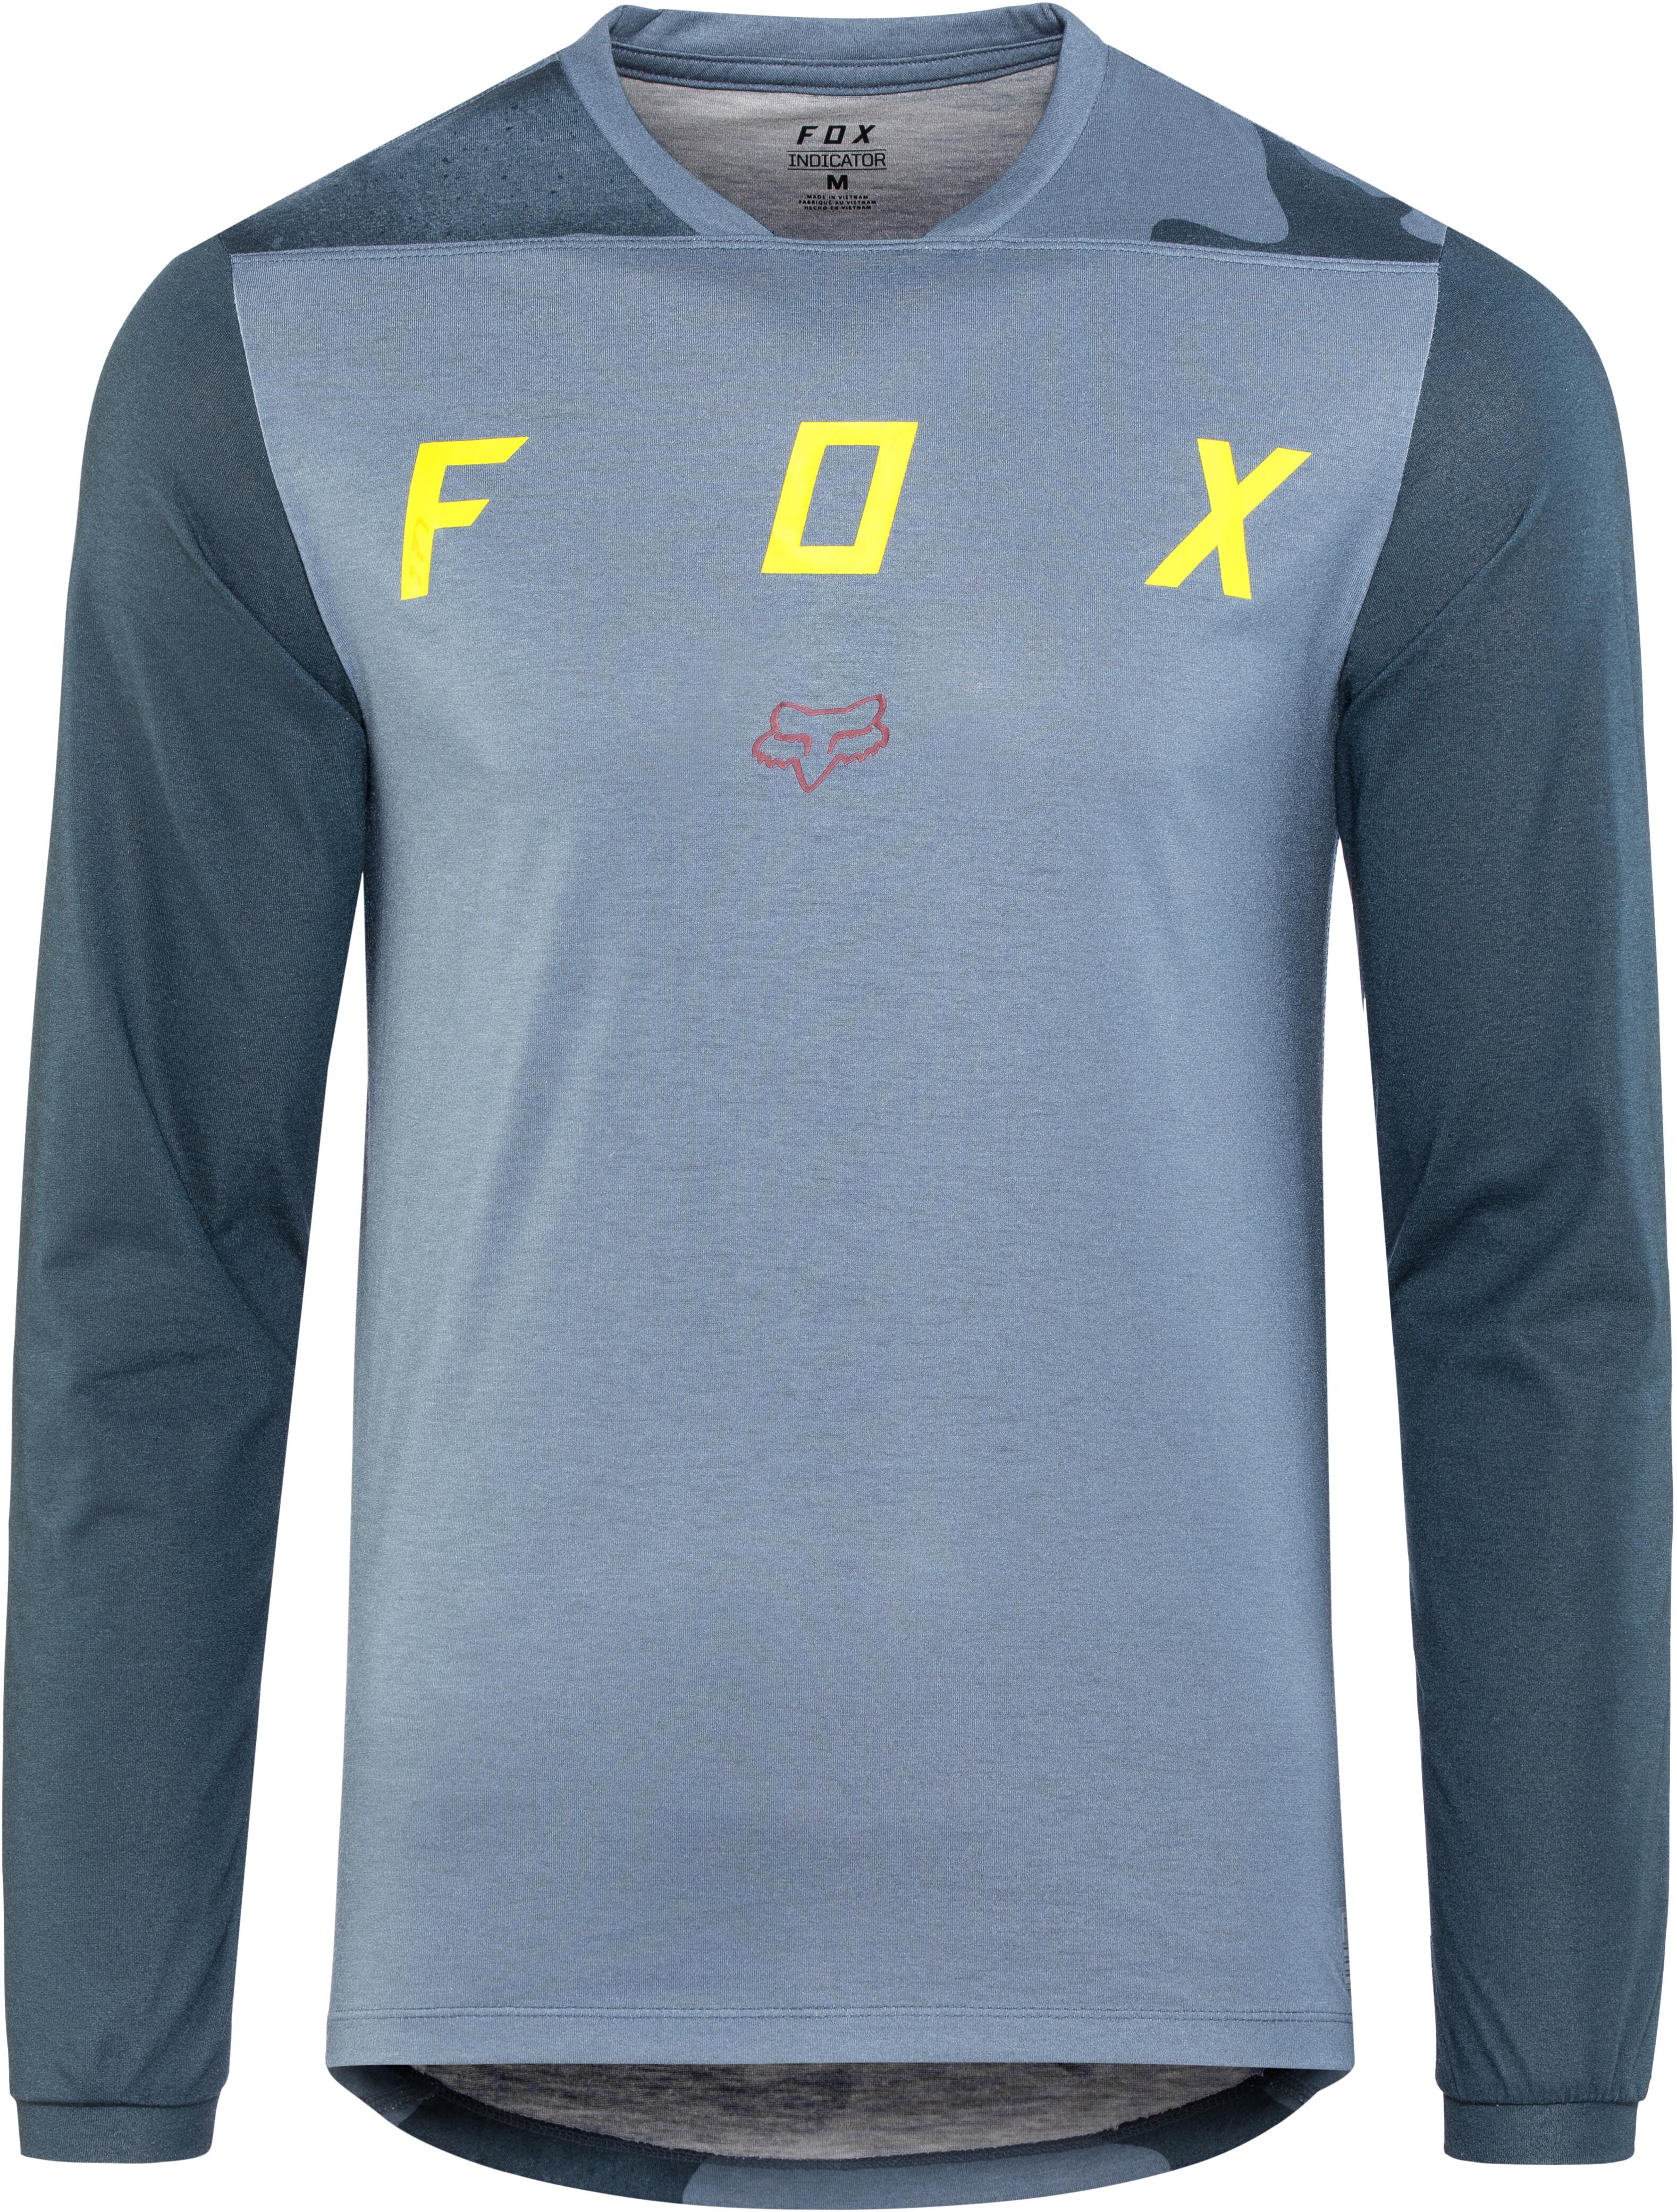 Fox Indicator Mash Camo Bike Jersey Longsleeve Men blue at Bikester ... ae01527dc